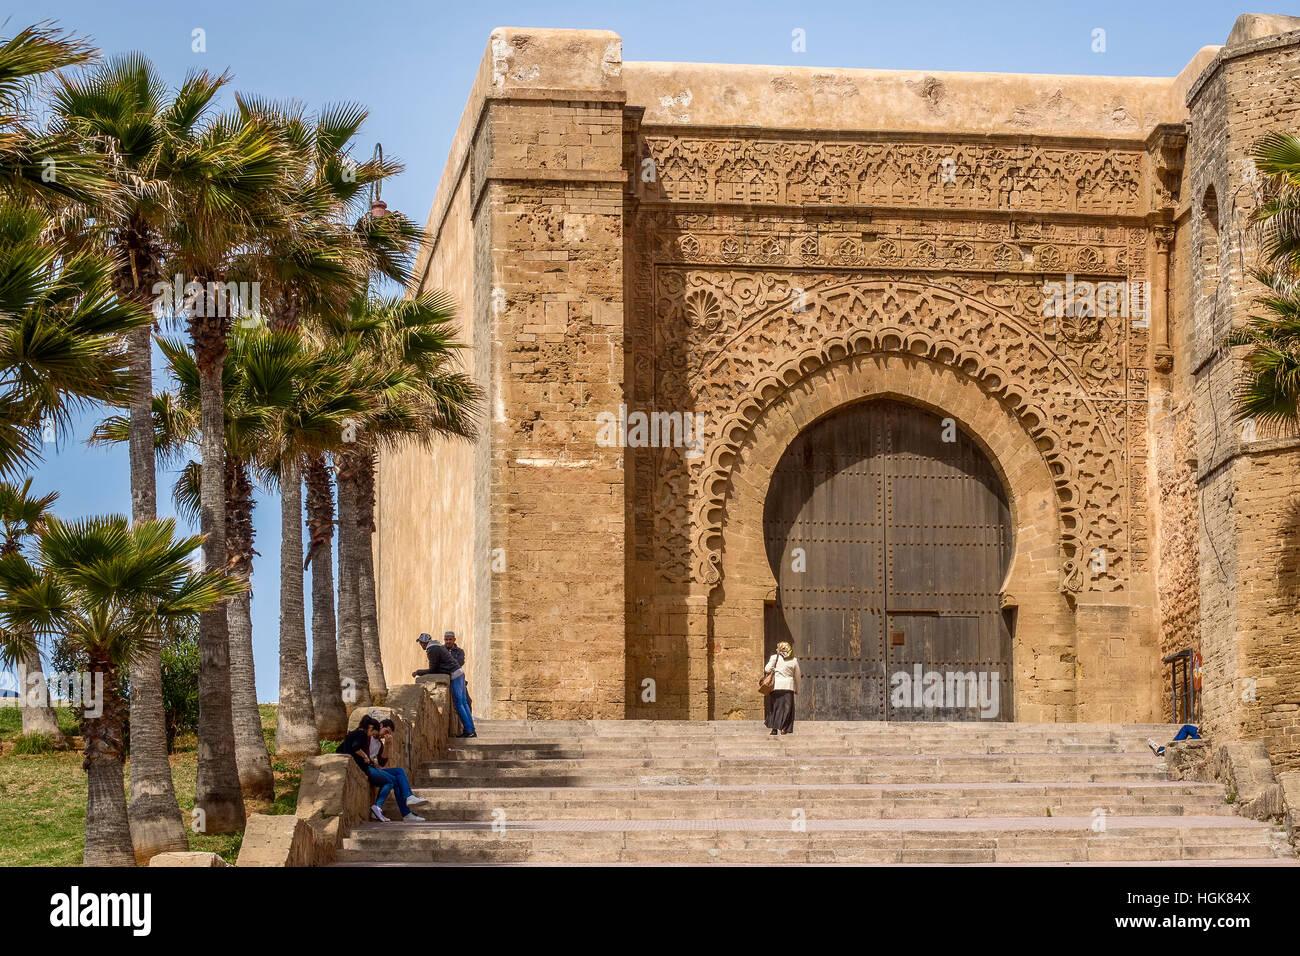 Grande porte d 39 entr e kasbah des oudayas rabat maroc - Grande porte d entree ...